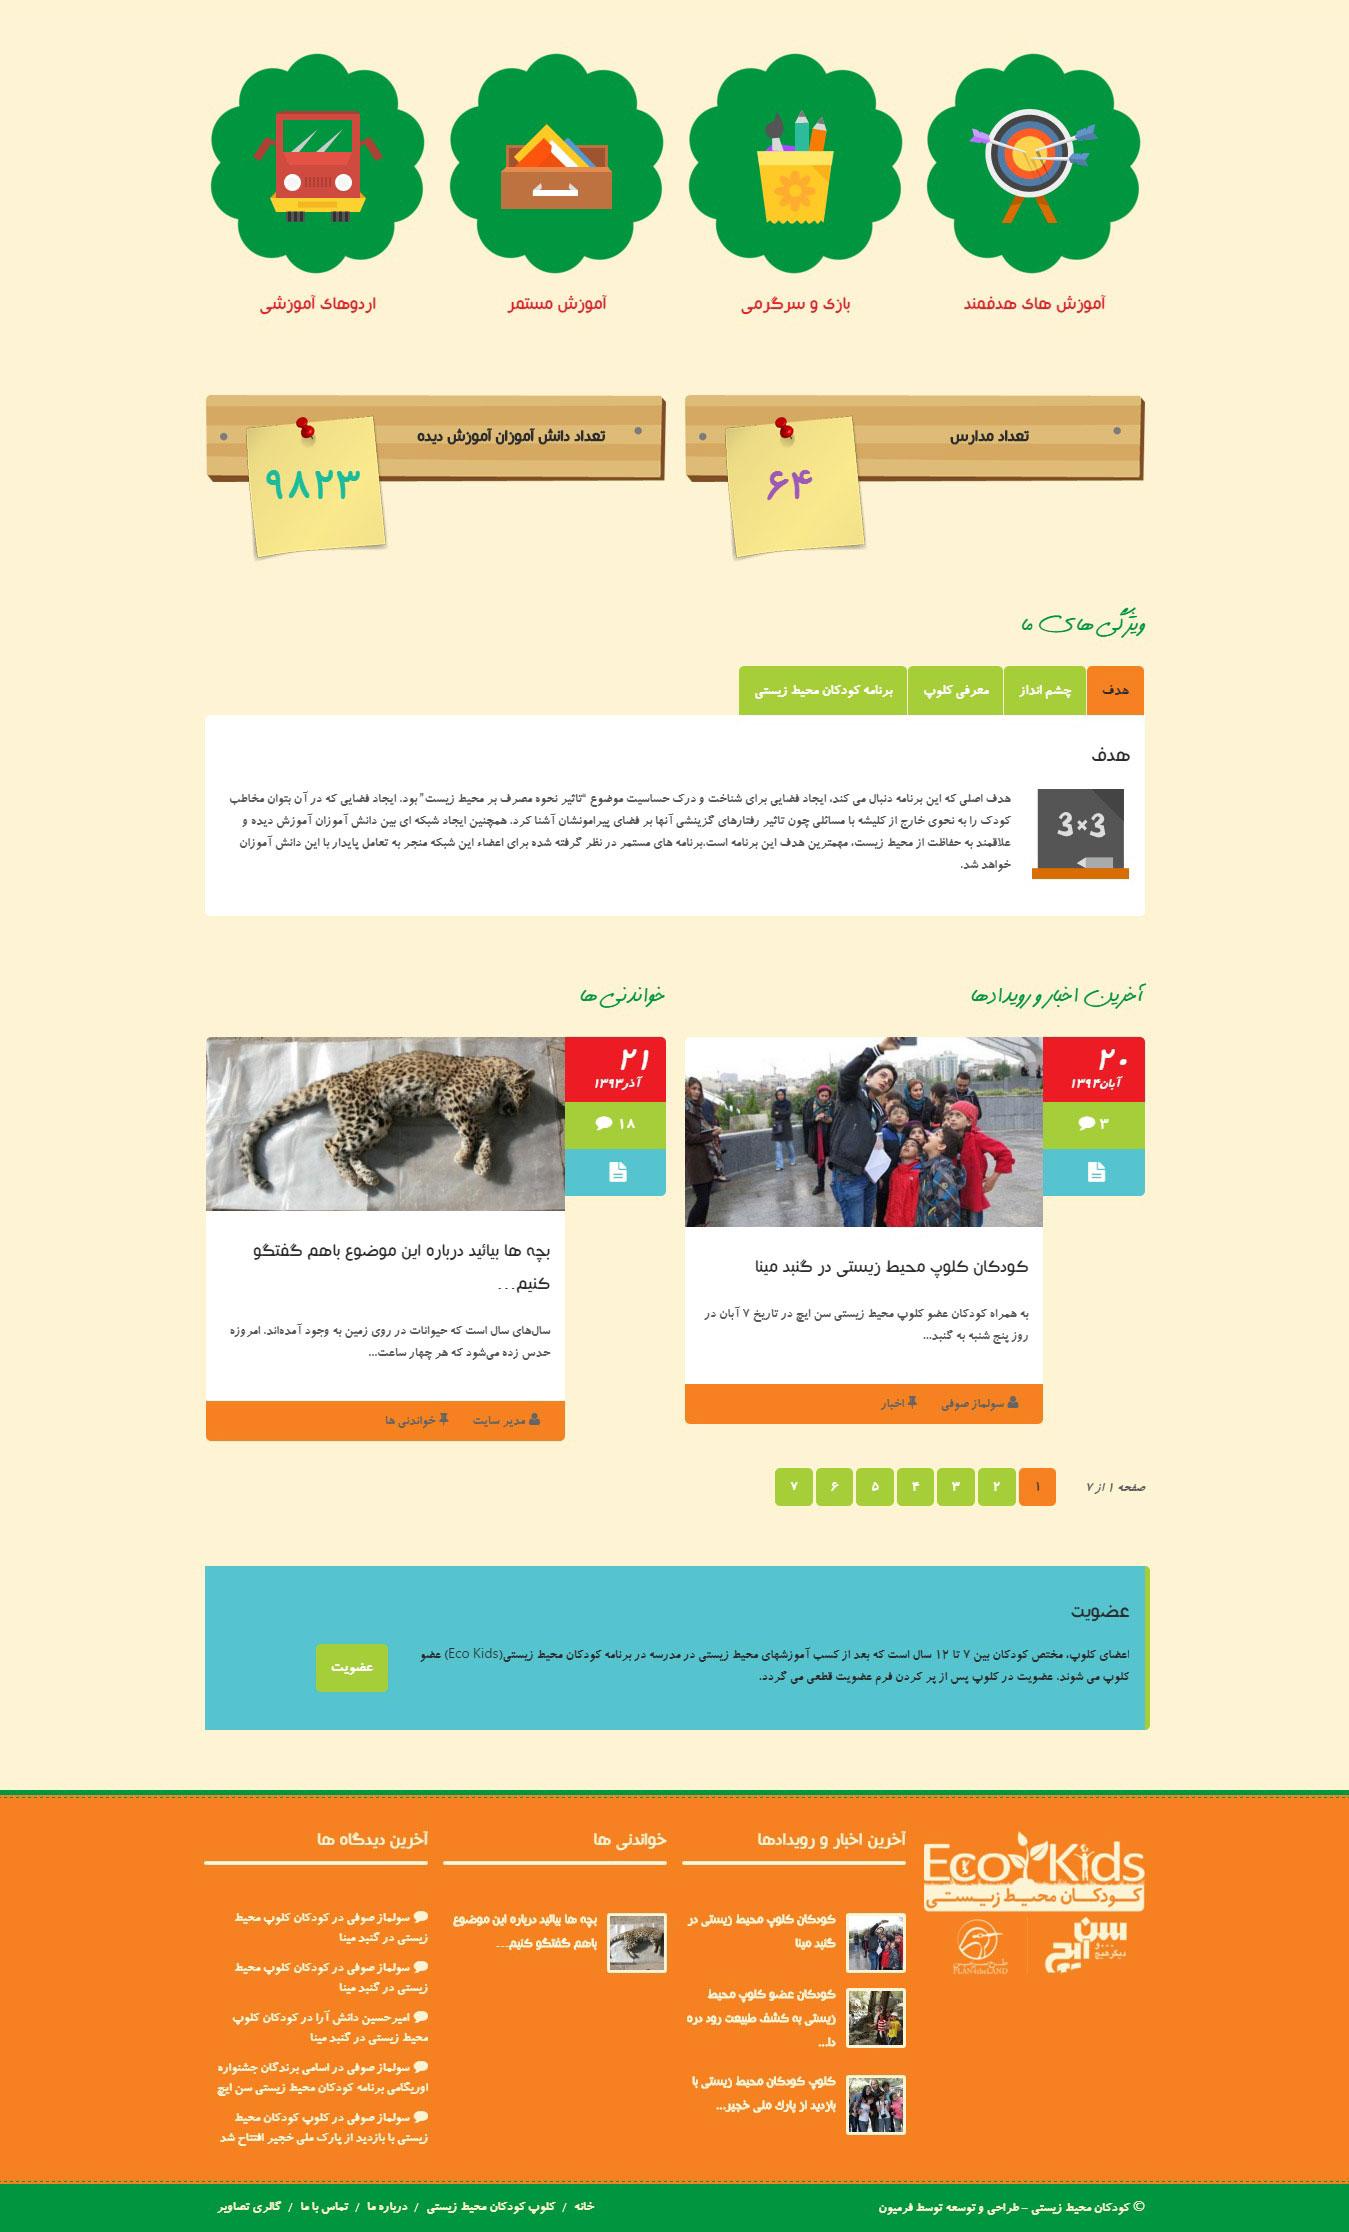 sunich-ecokids.com_homepage